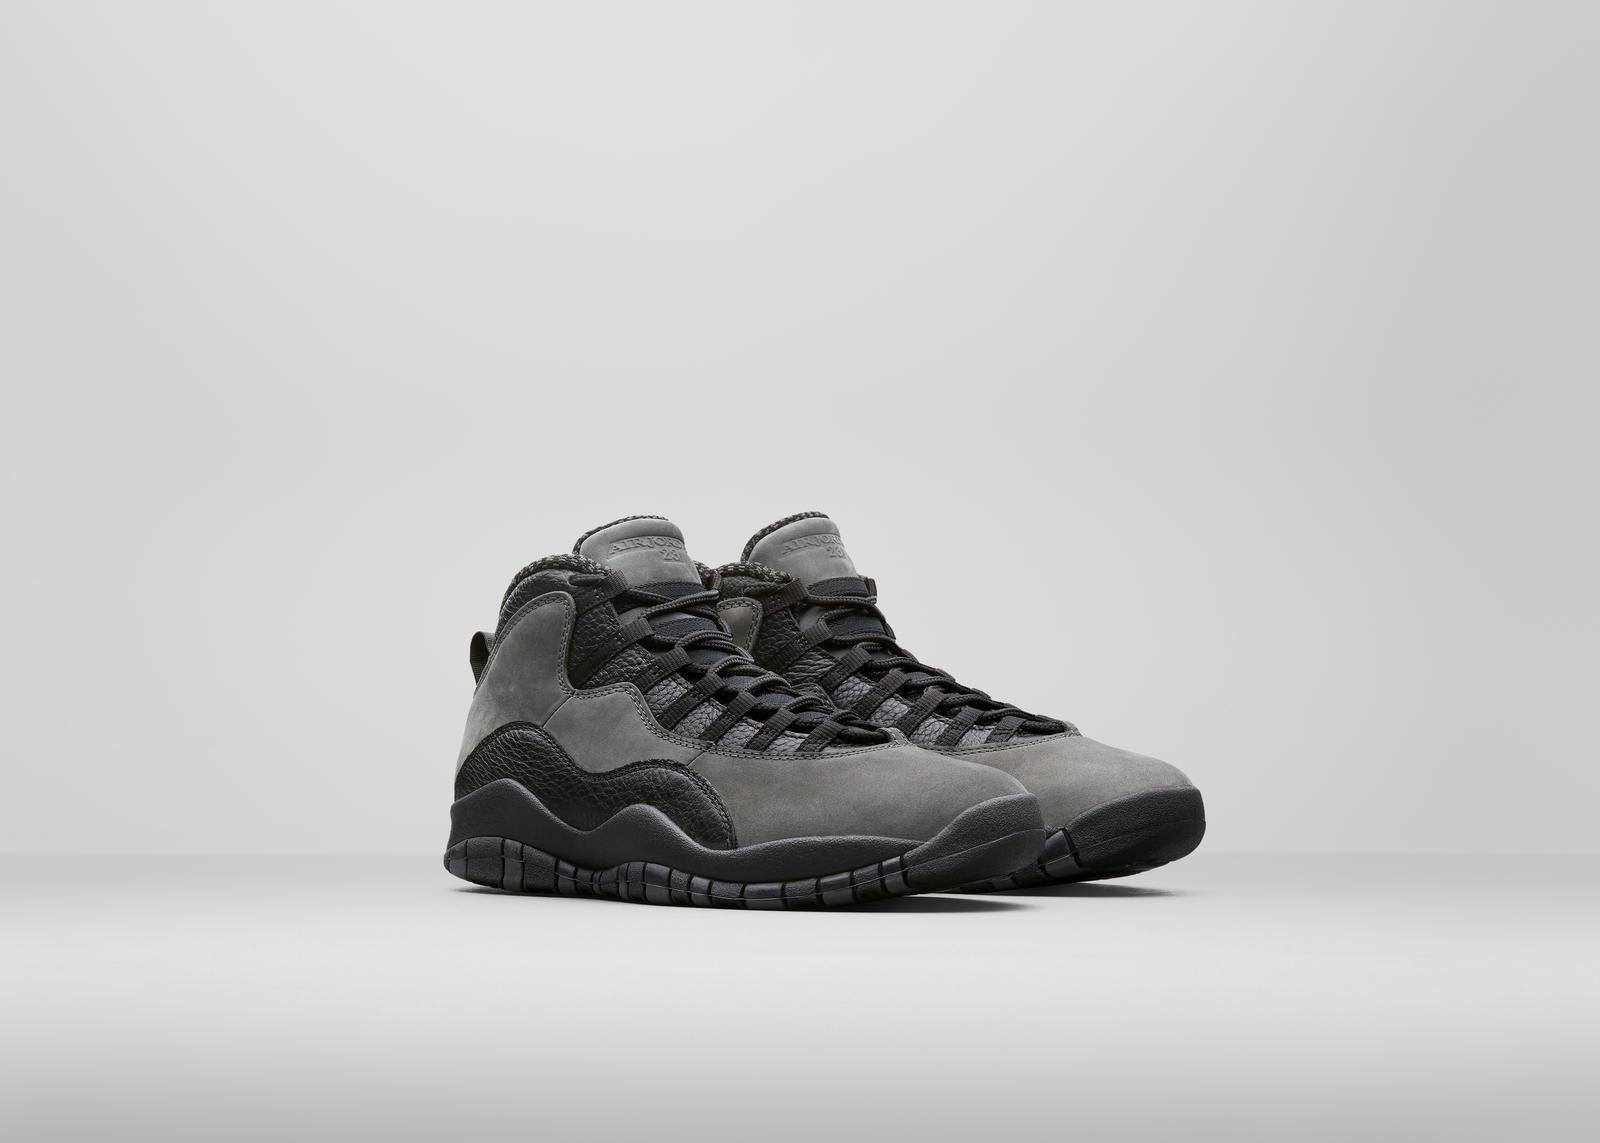 Air Jordan 10 Dark Shadow